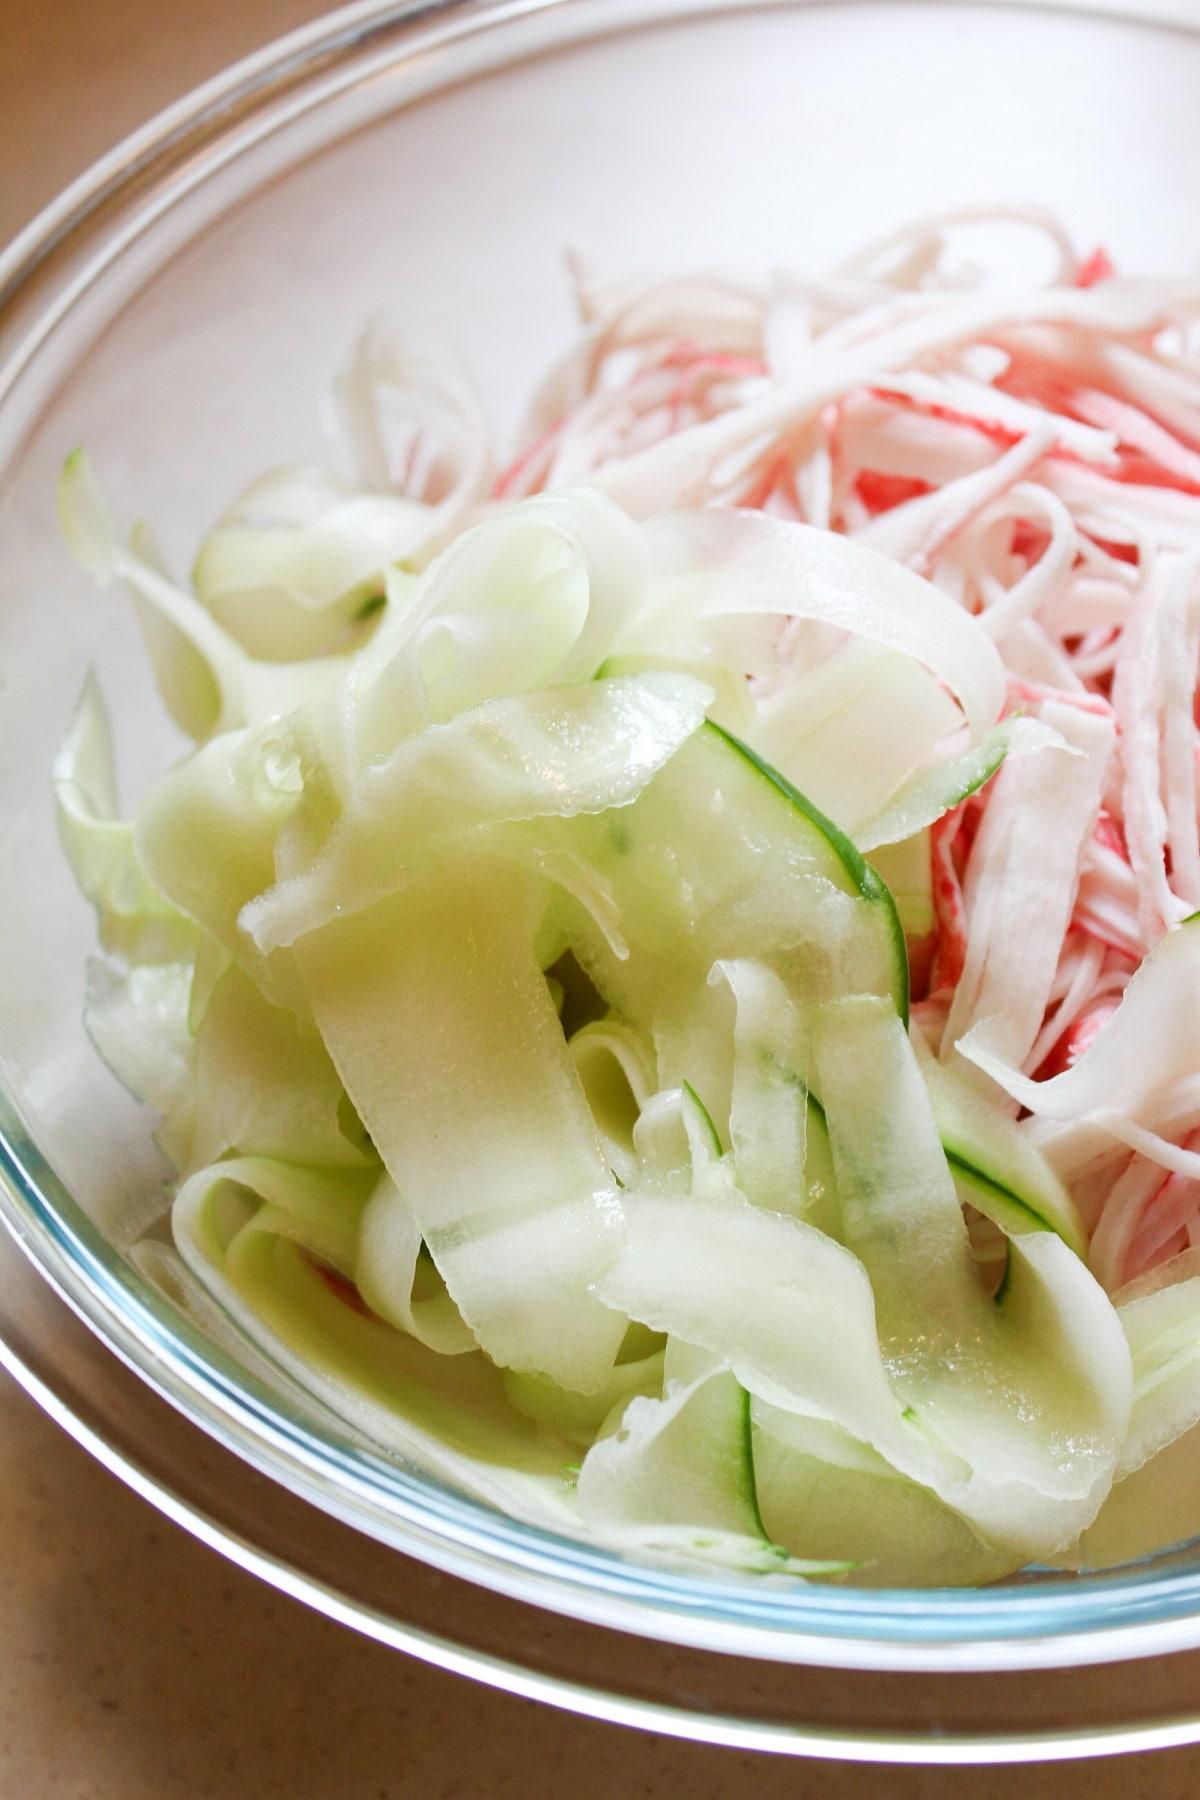 sliced cucumber in bowl